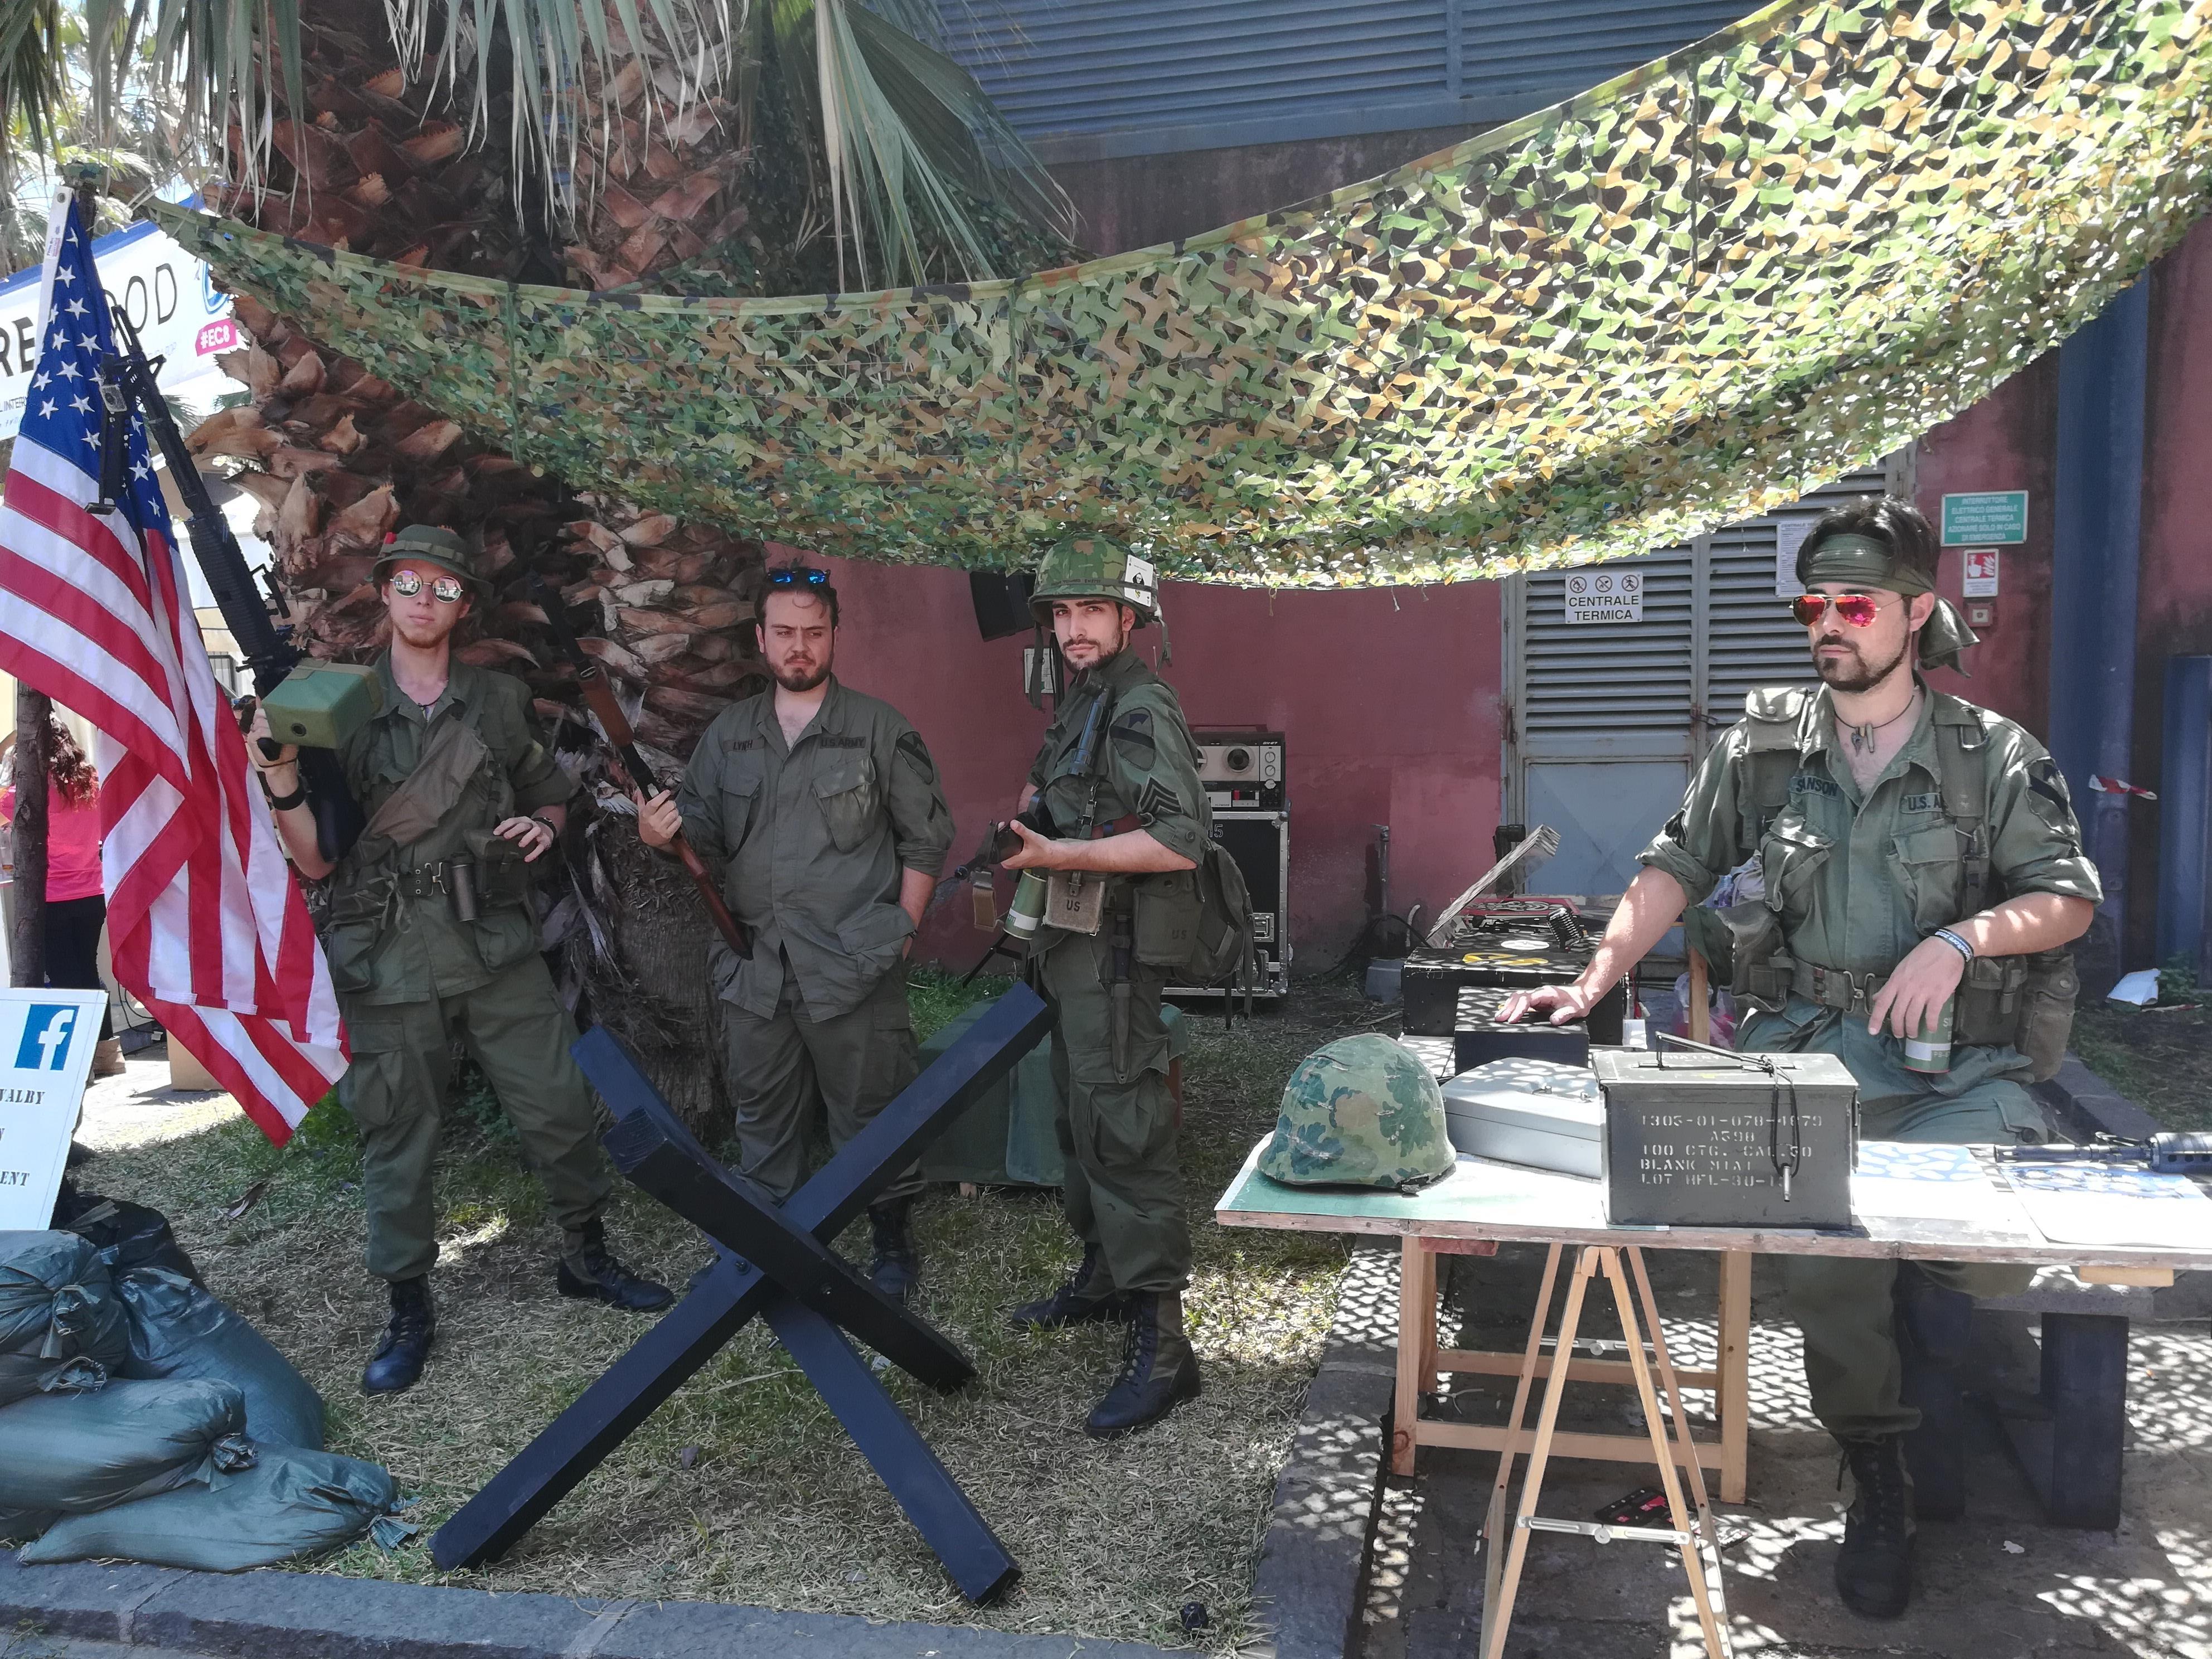 La foto dei soldati